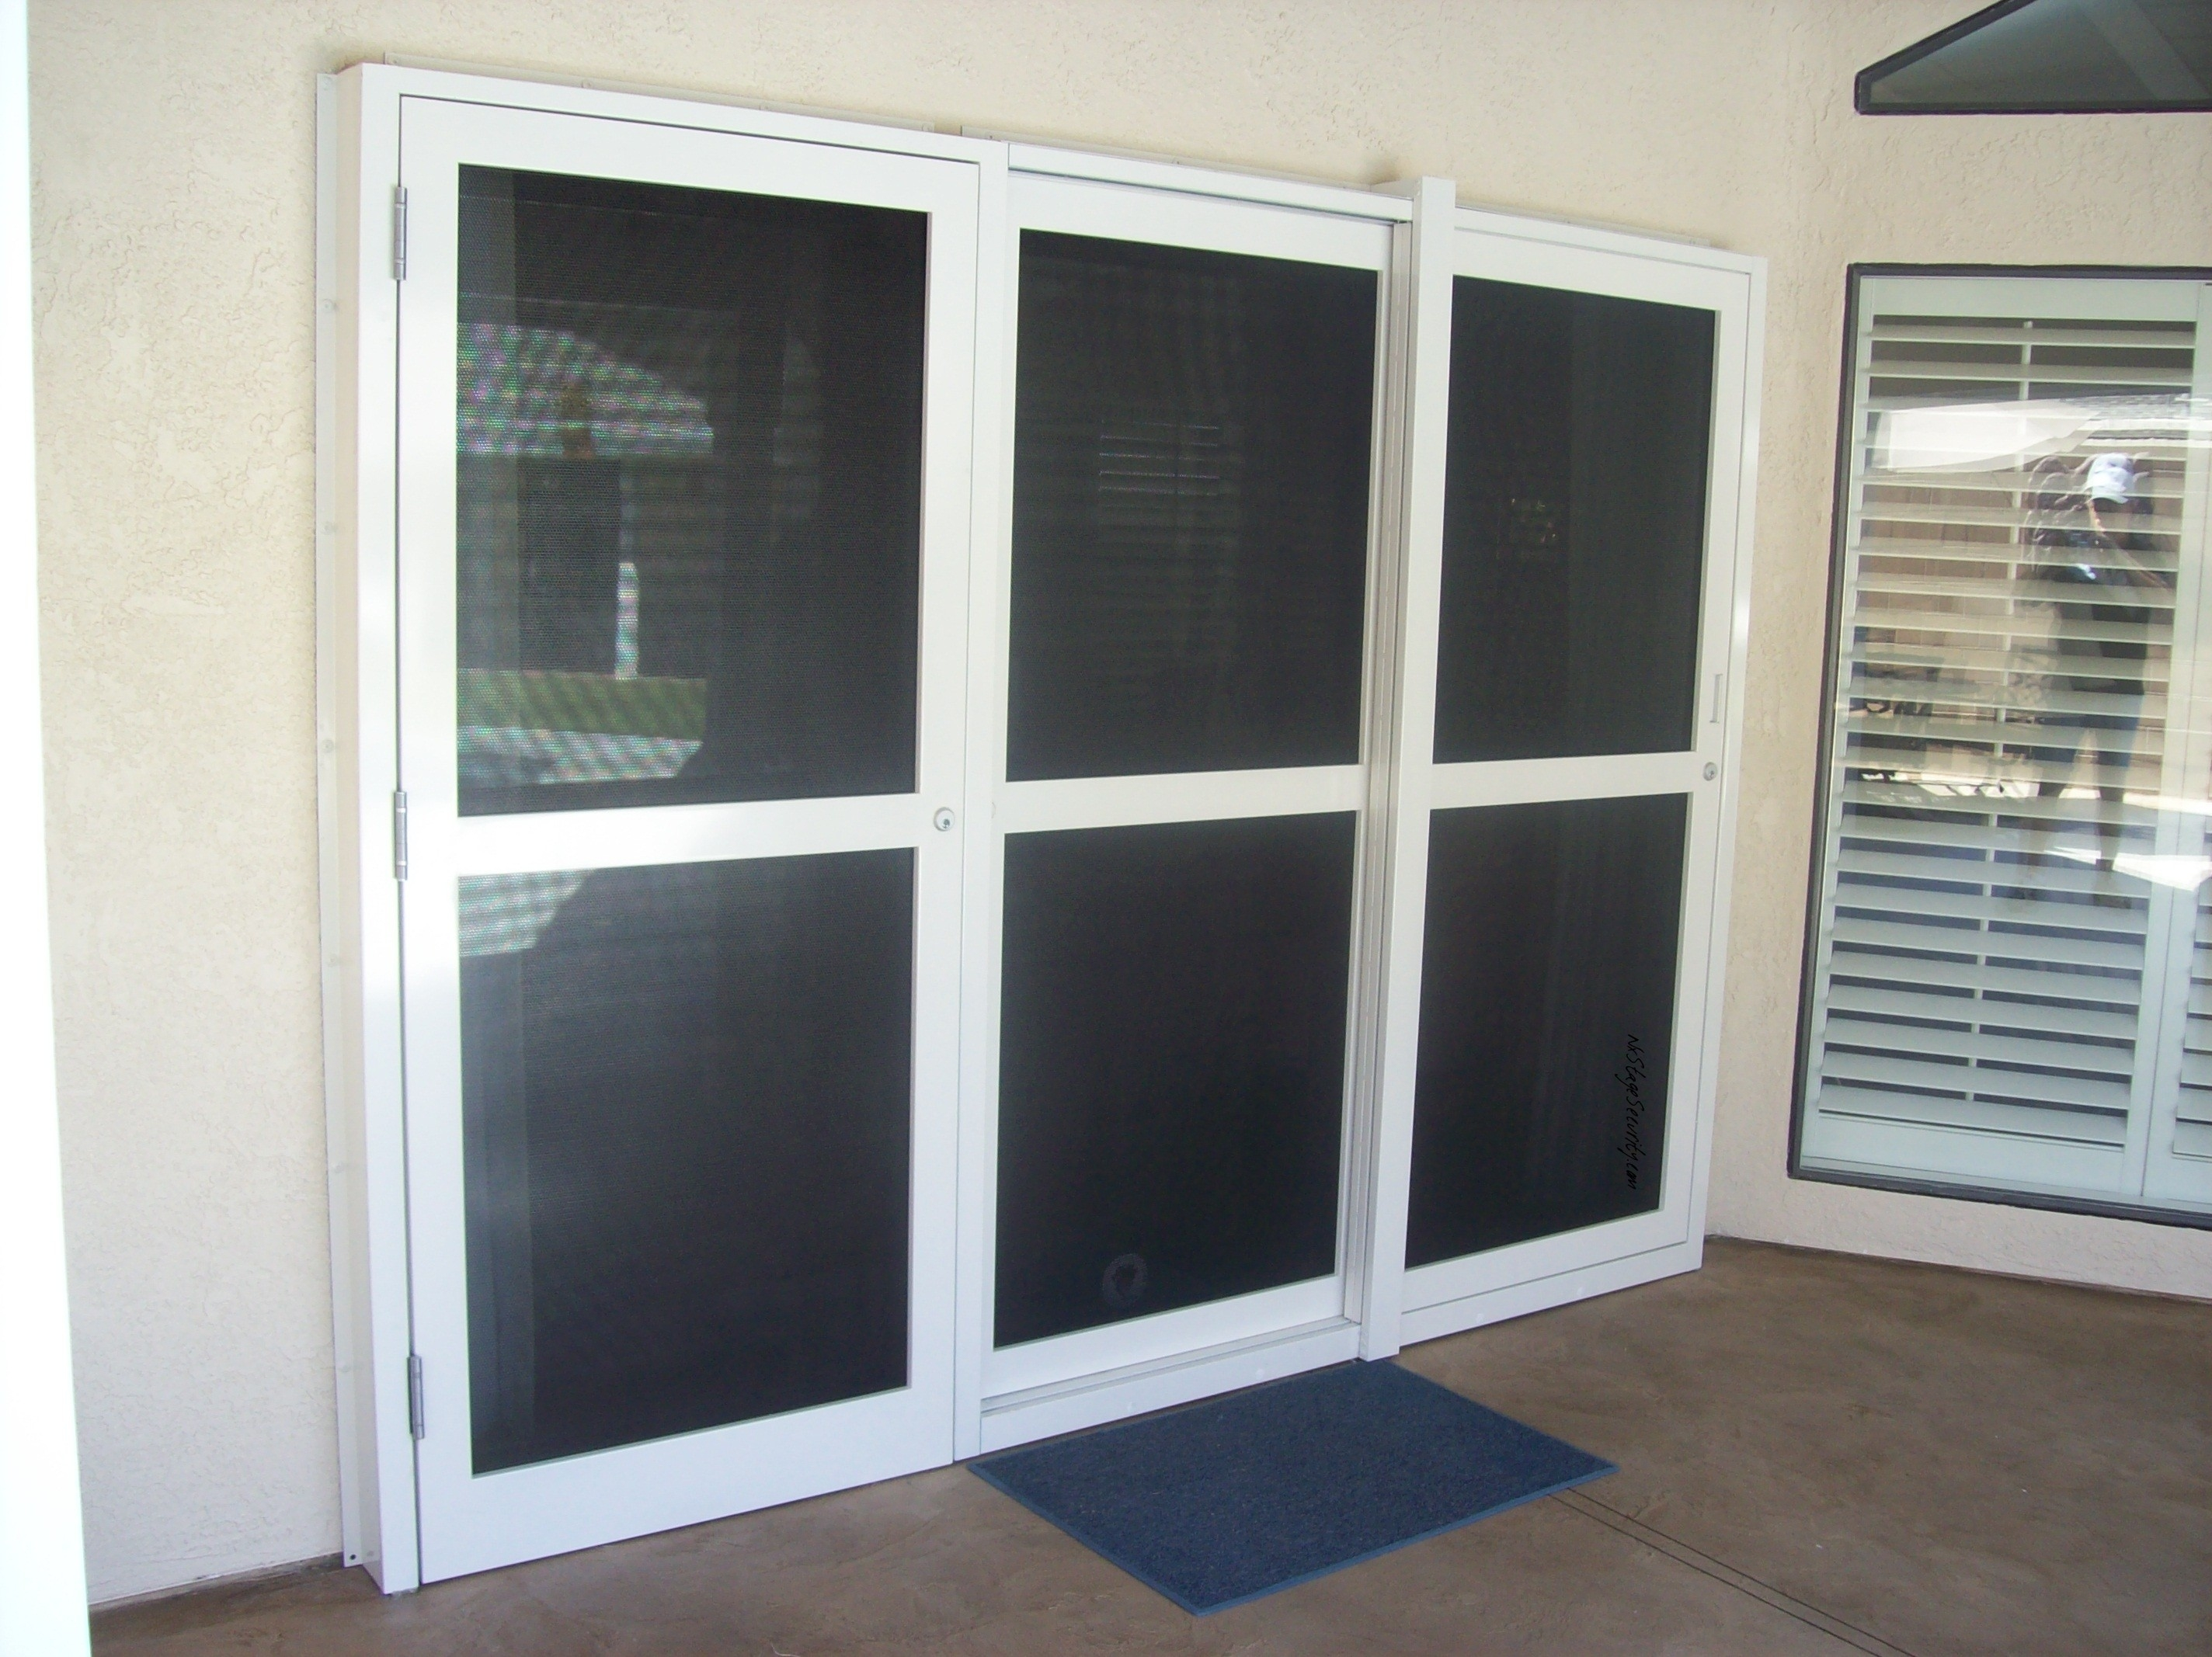 Securing Sliding Glass Patio Doorsliding glass door alarm